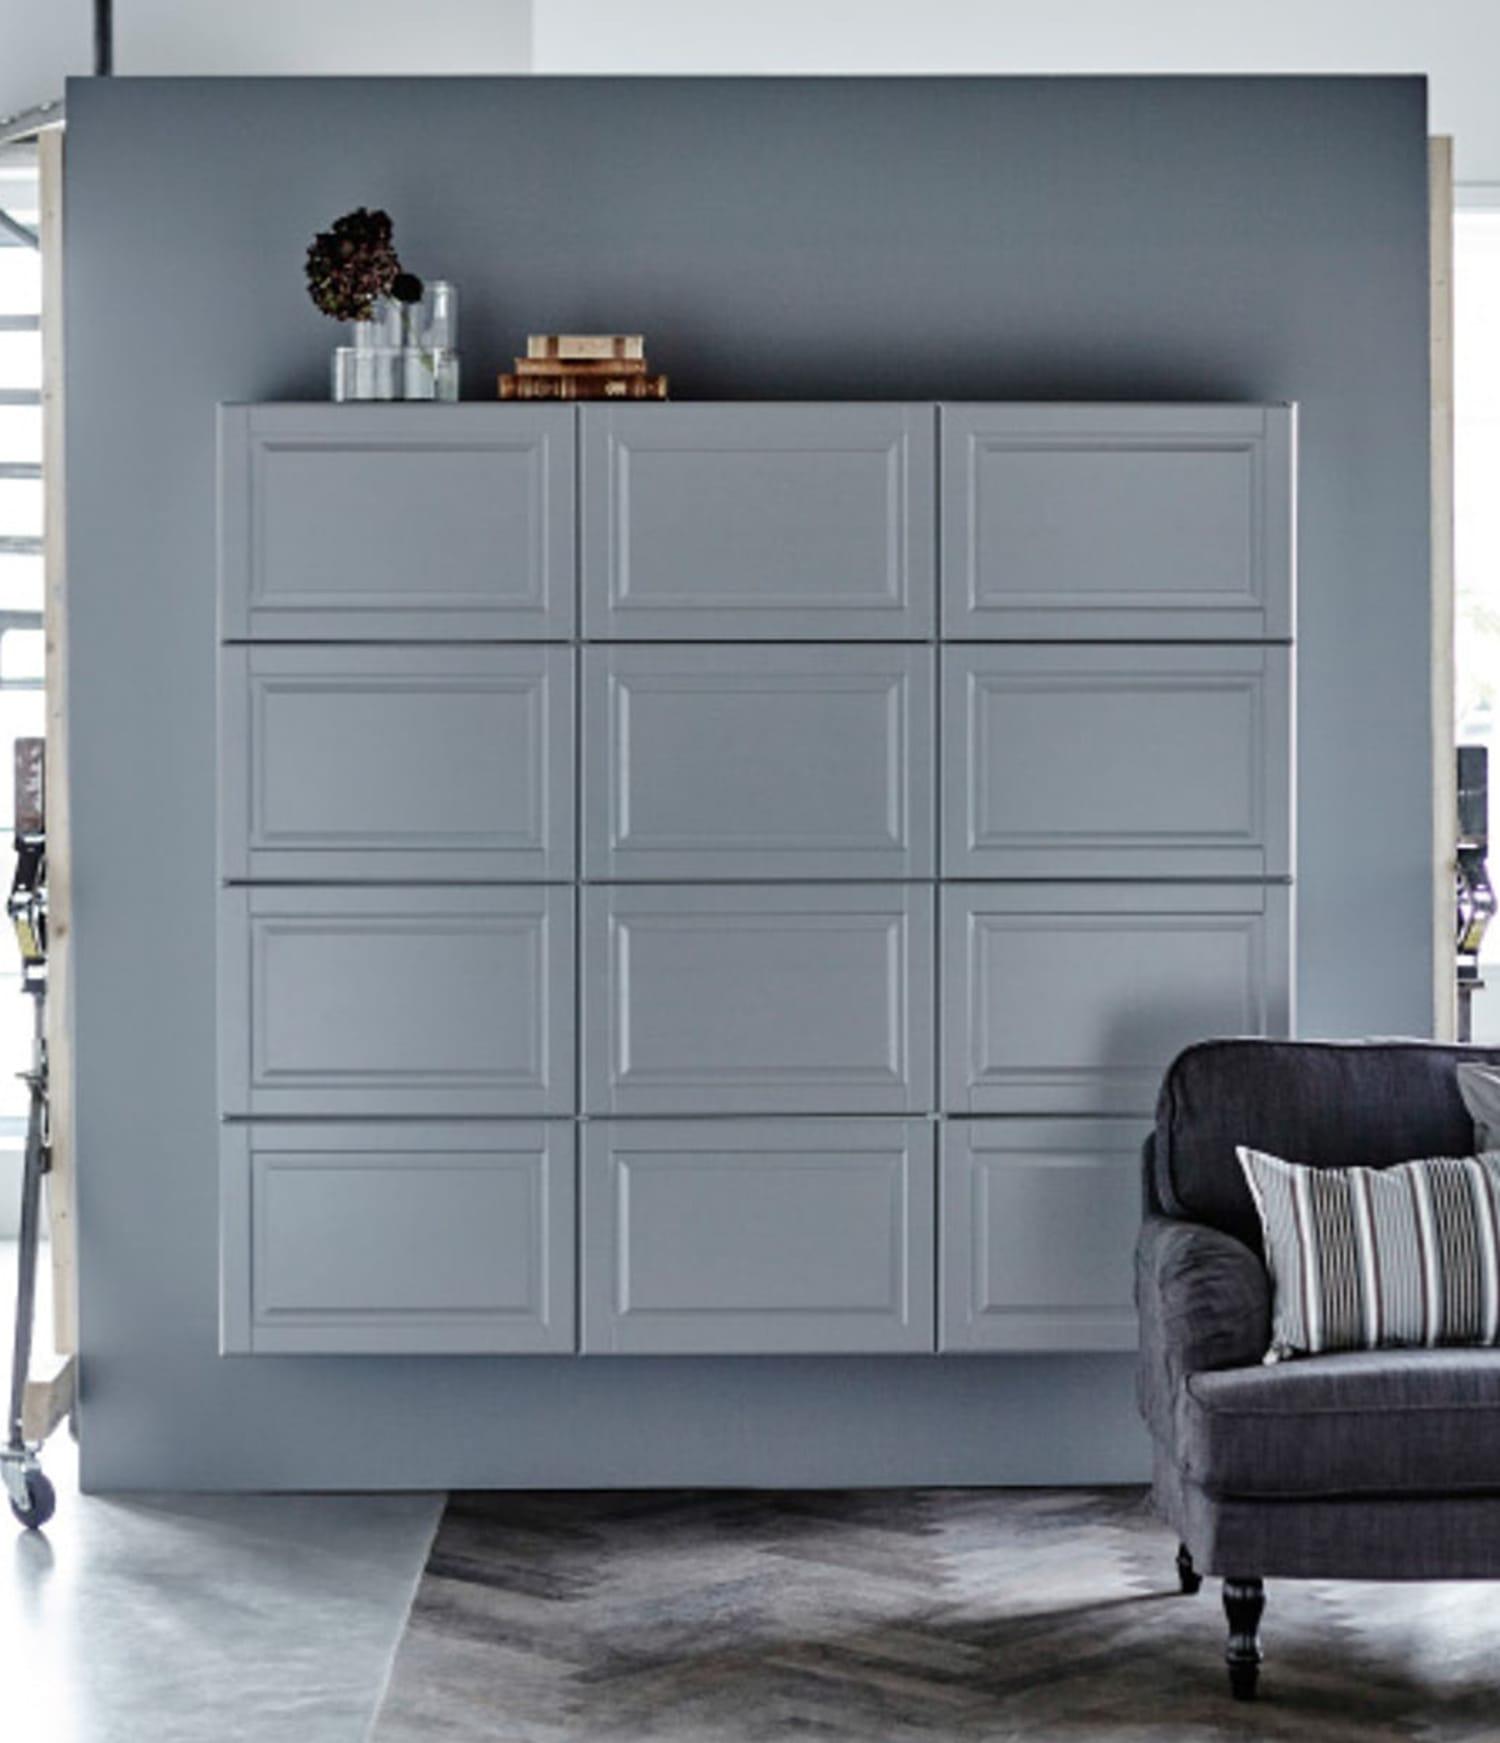 Wall Decor Ideas - Budget IKEA Hacks